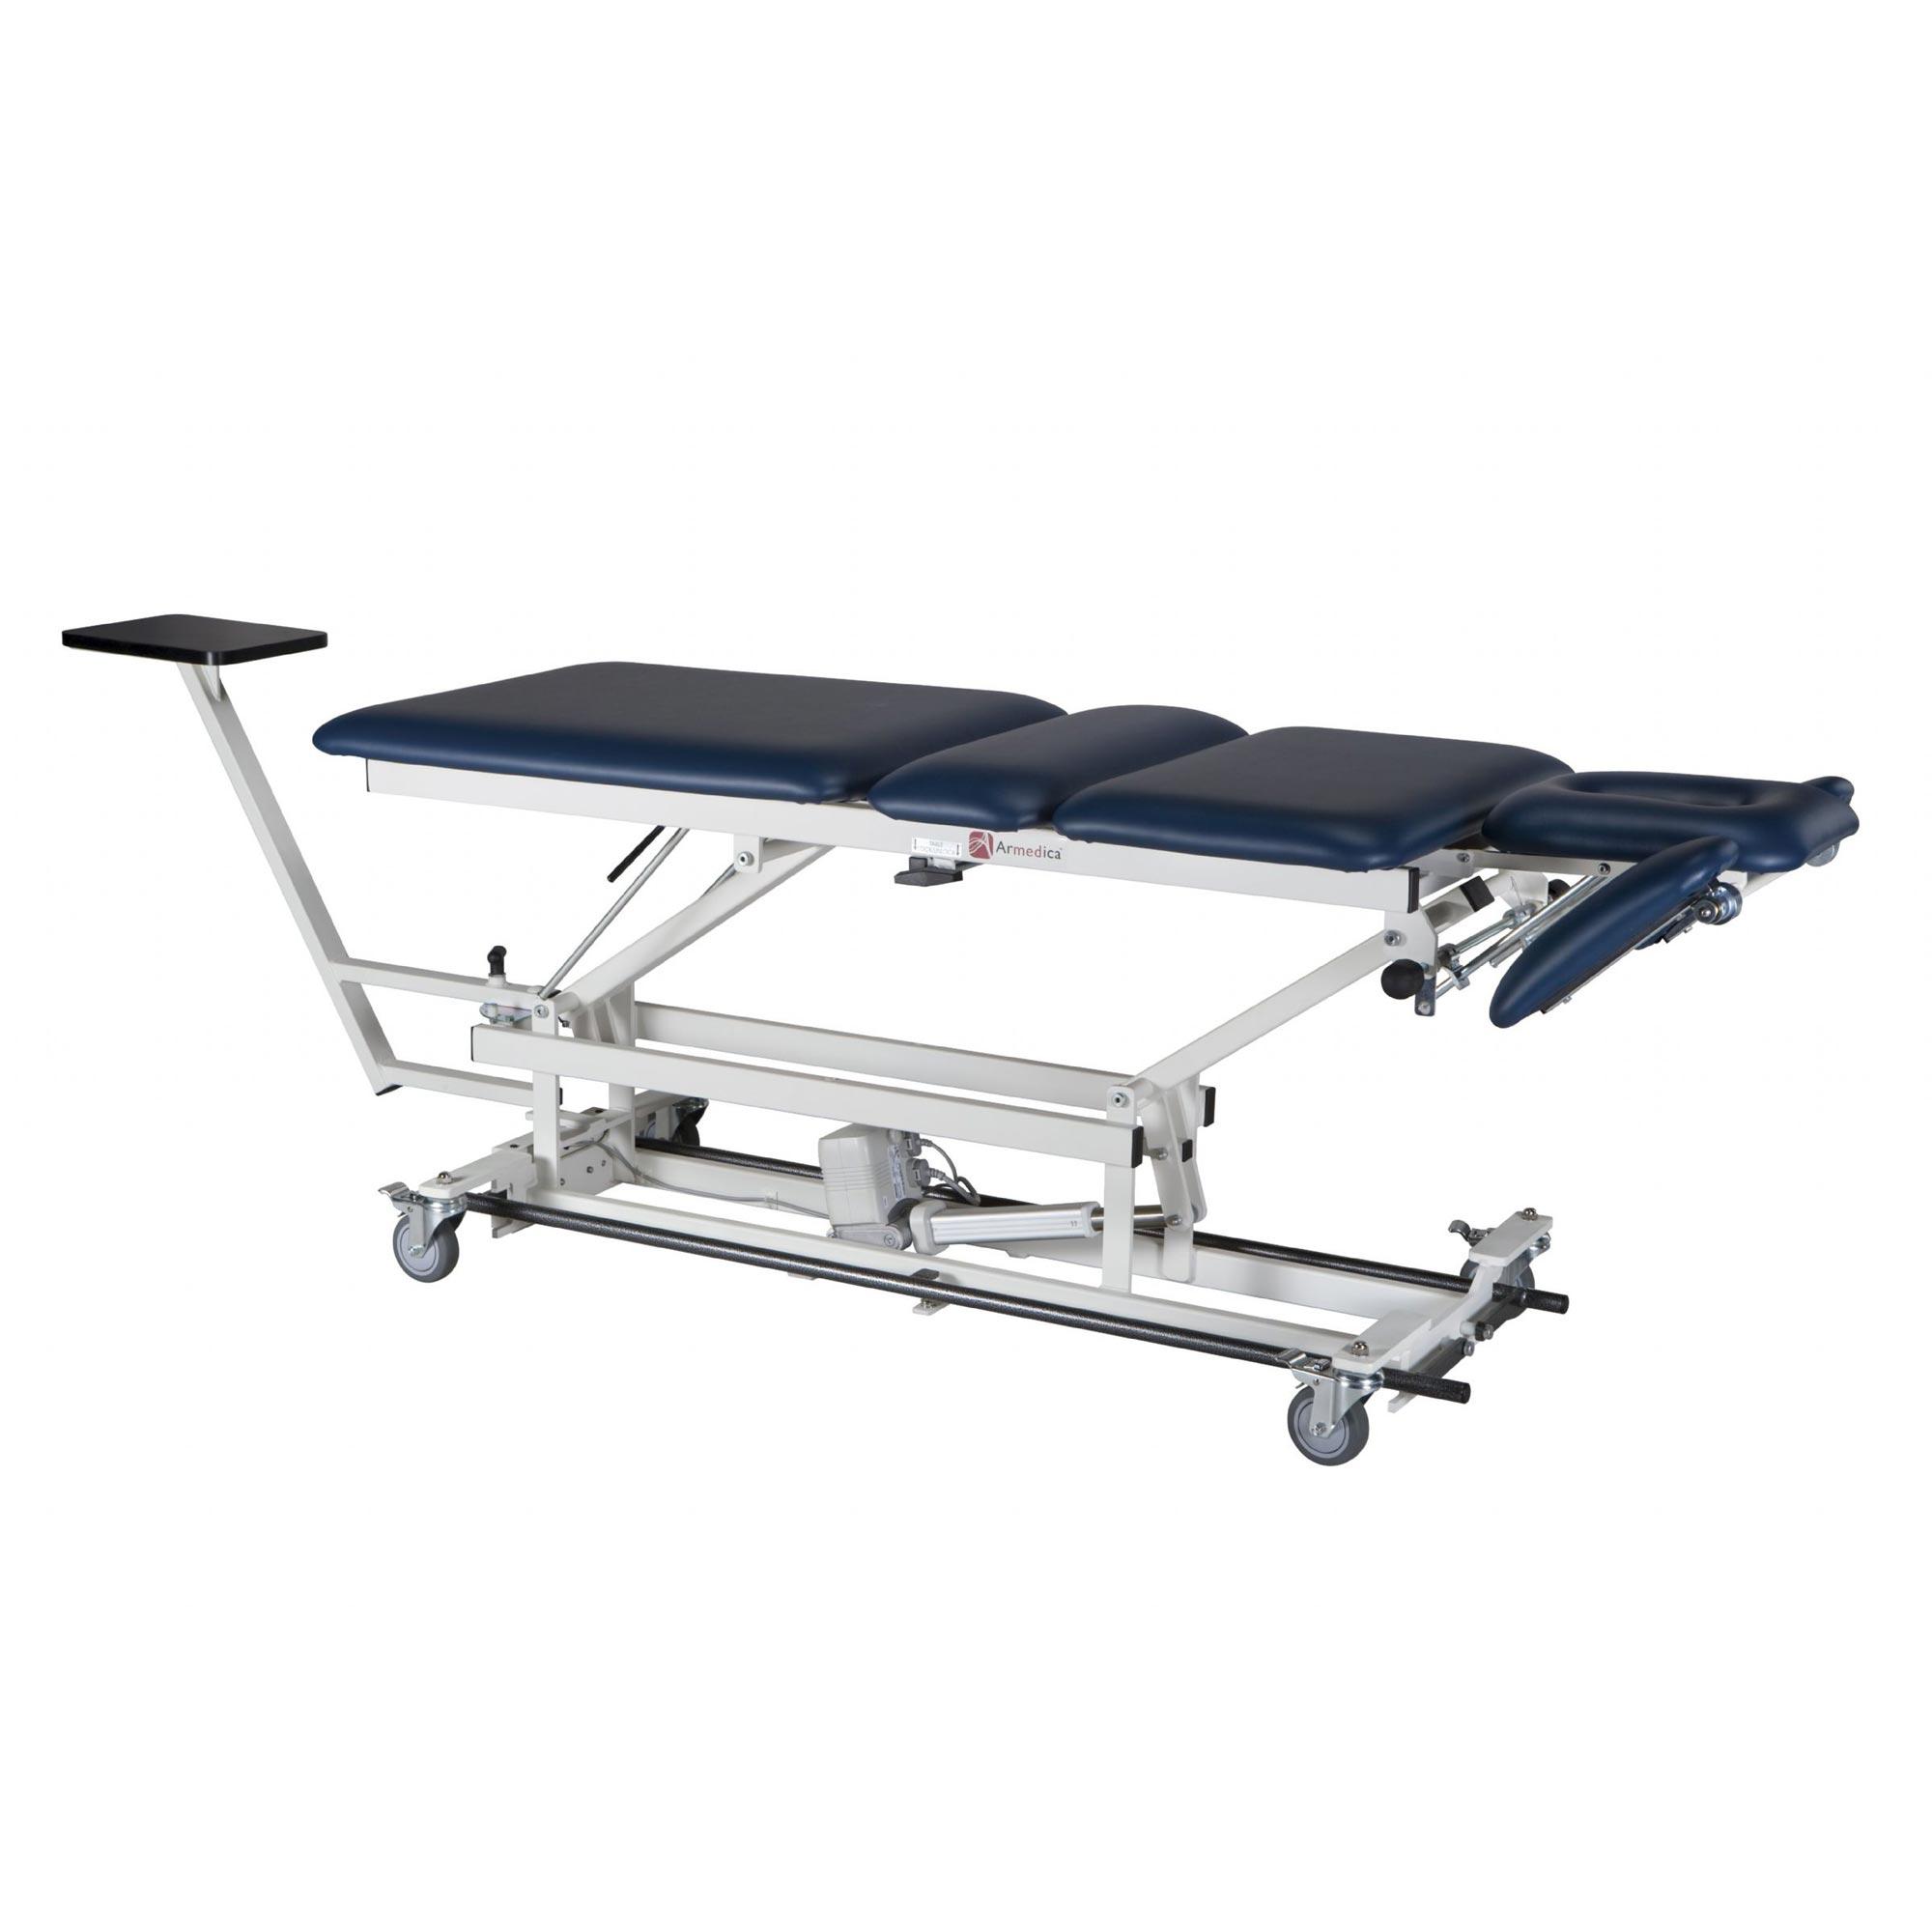 Armedica AM-BA 450 treatment table